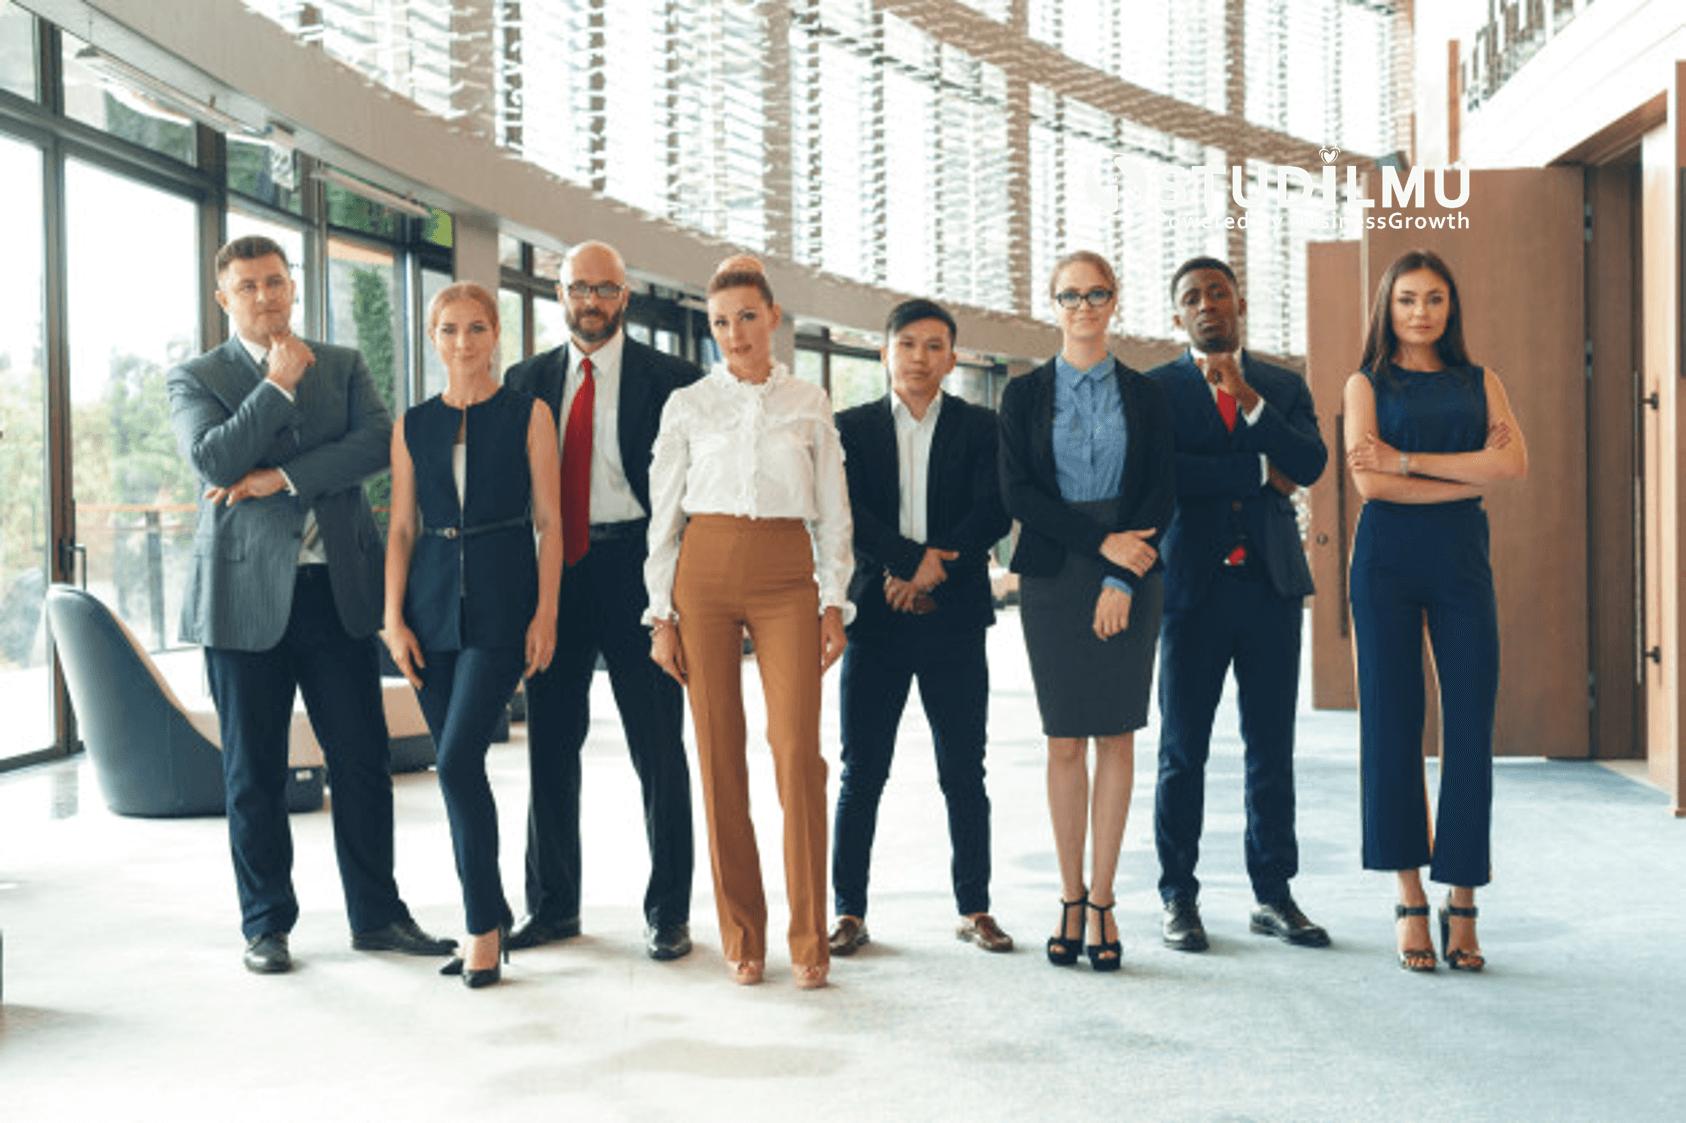 STUDILMU Career Advice - Kelebihan dan Kekurangan Menjadi Orang Cerdas di Kantor